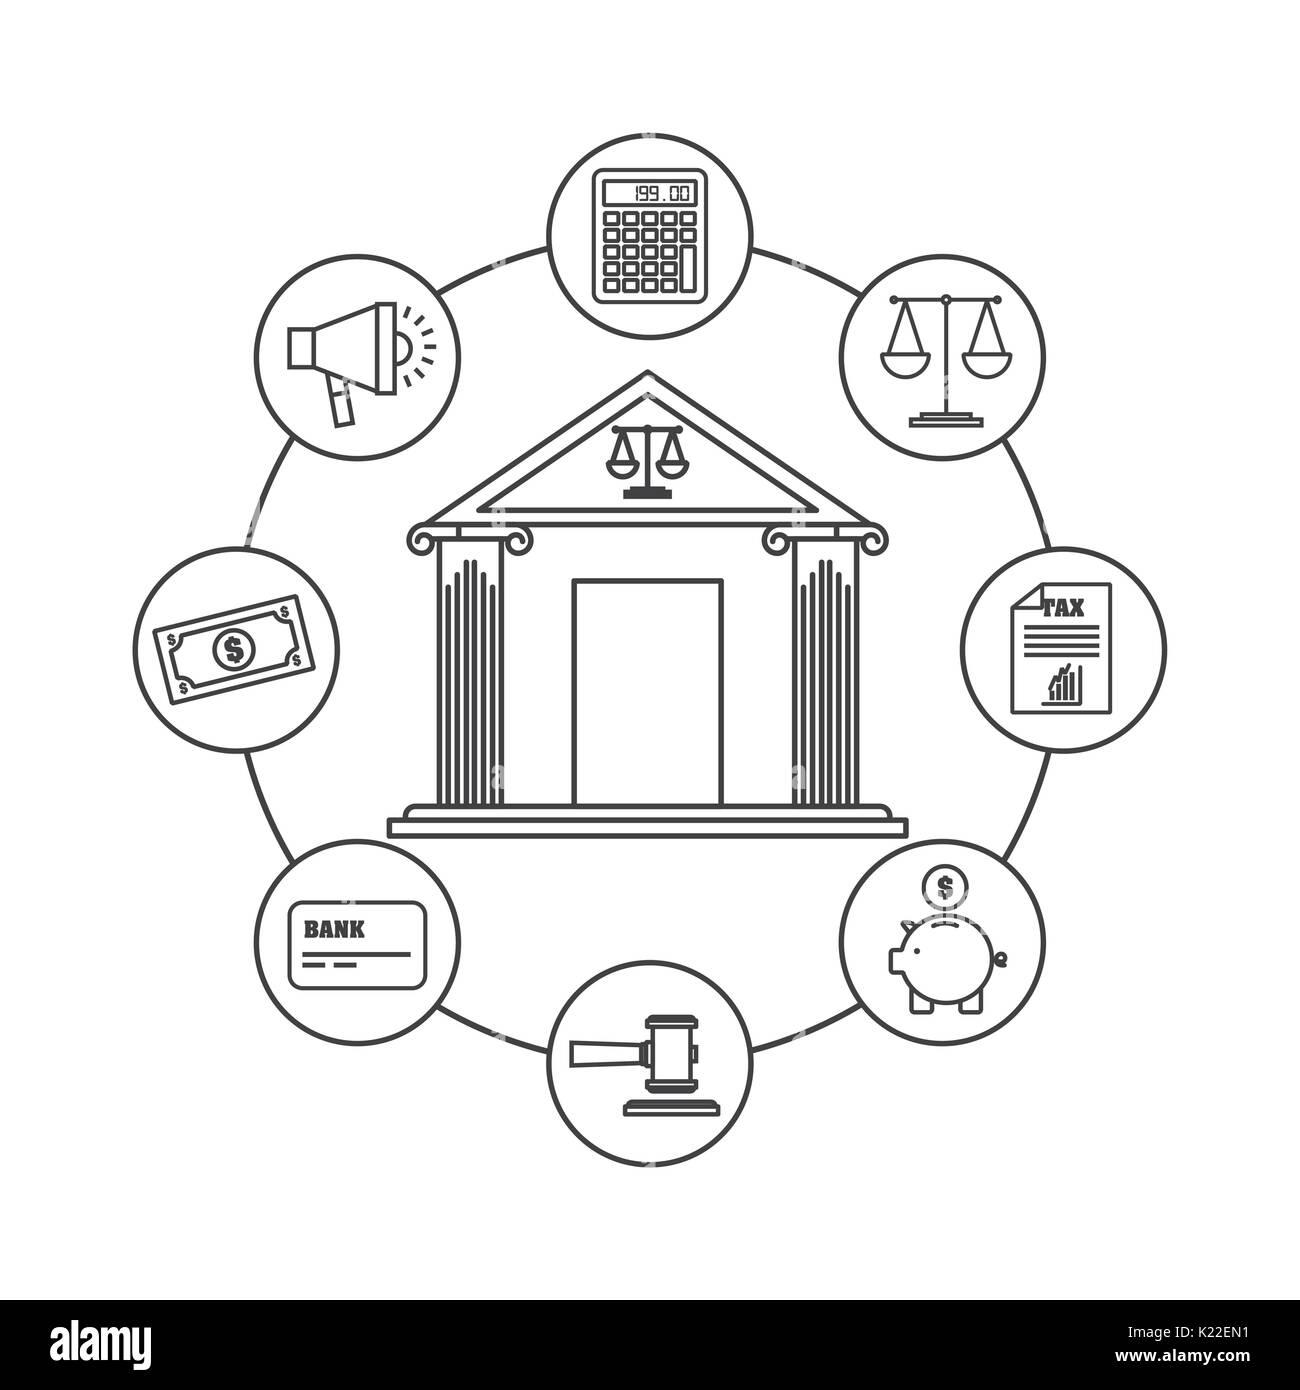 money concept design  - Stock Image